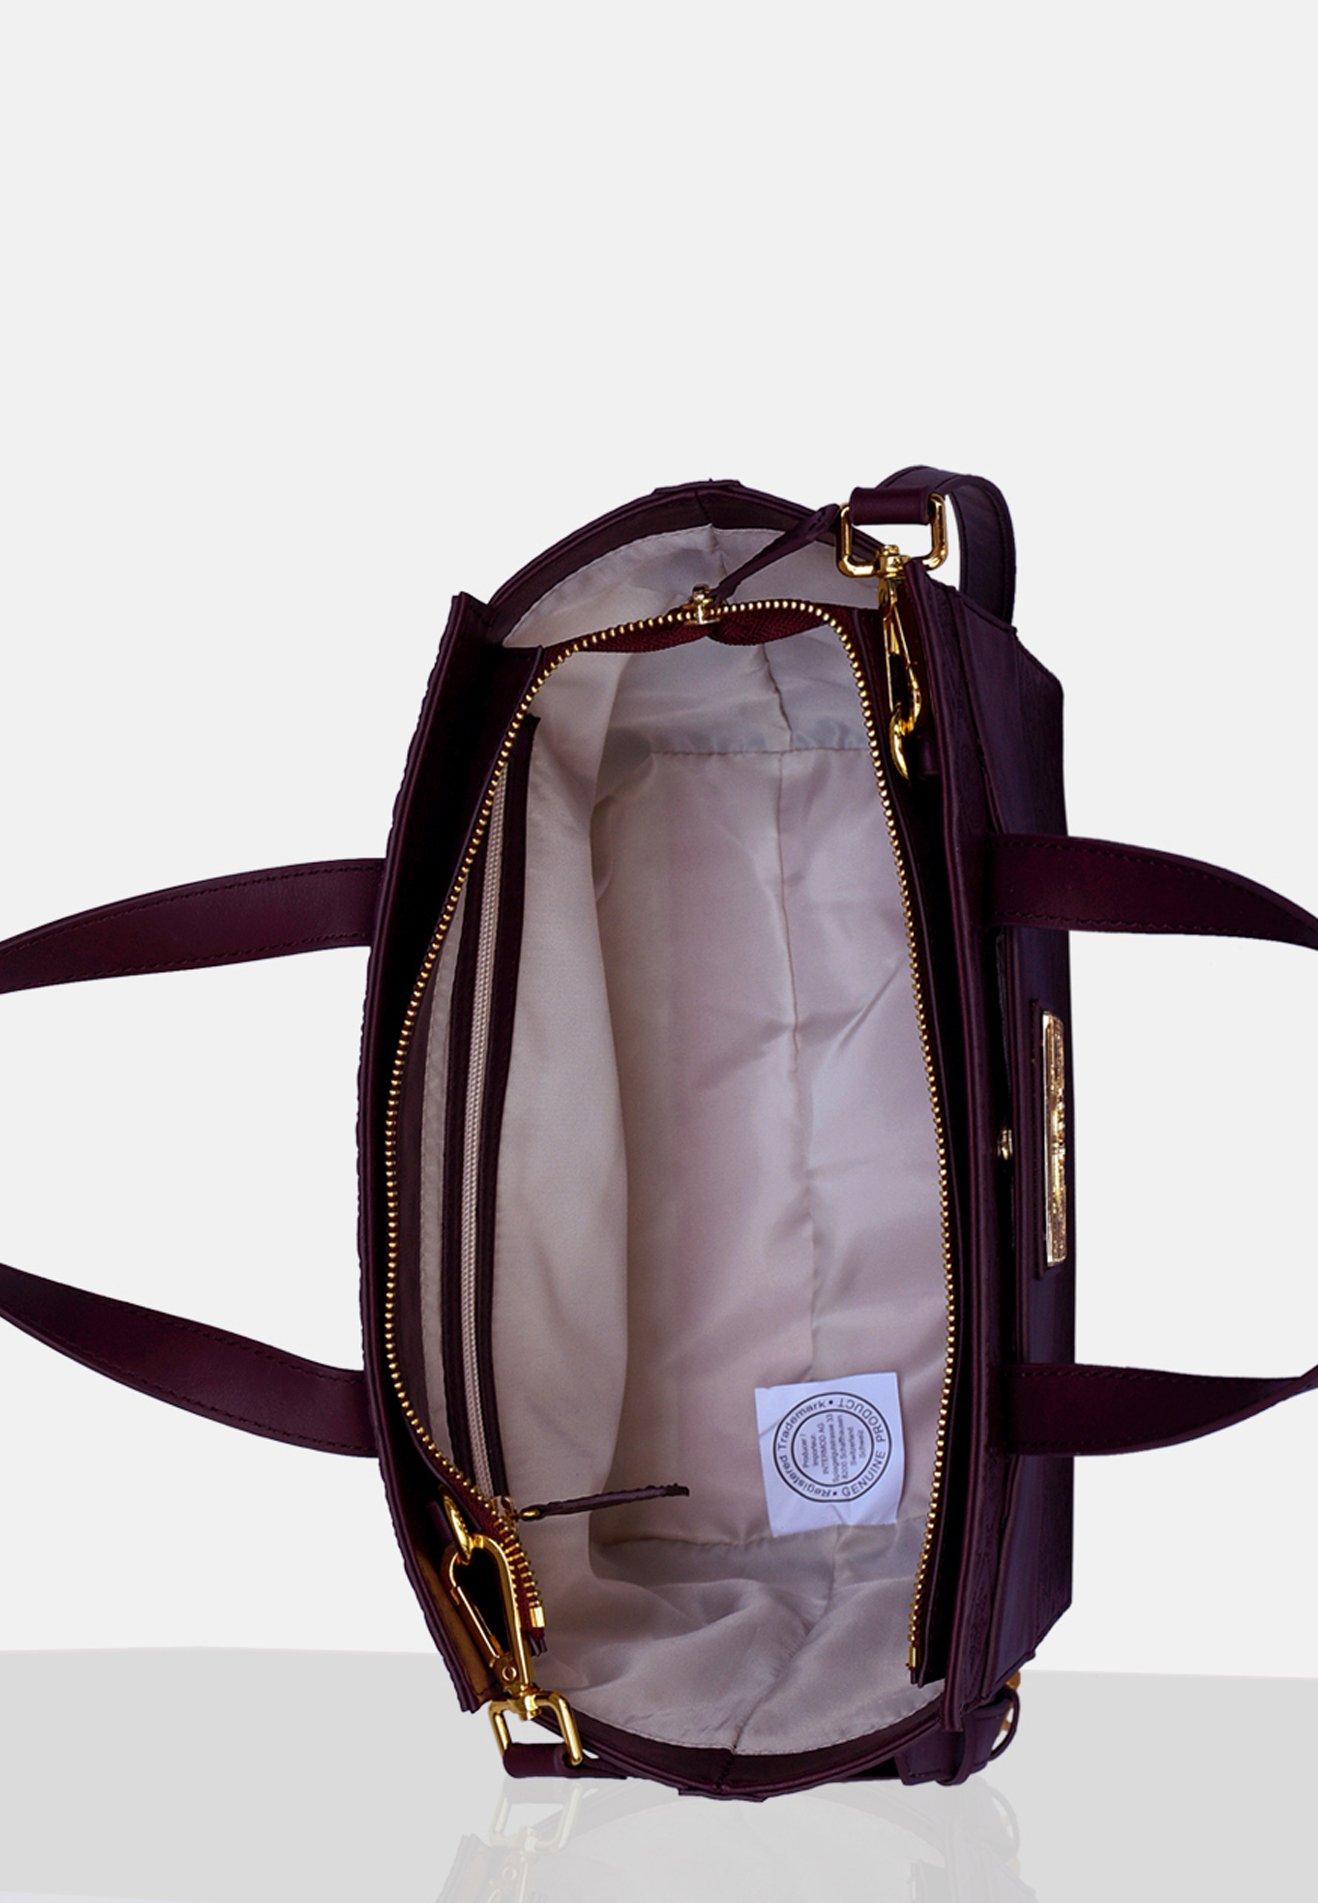 Exclusive Very Cheap Accessories Silvio Tossi Handbag berry BU8gmc0aj lO9EWKFZ9